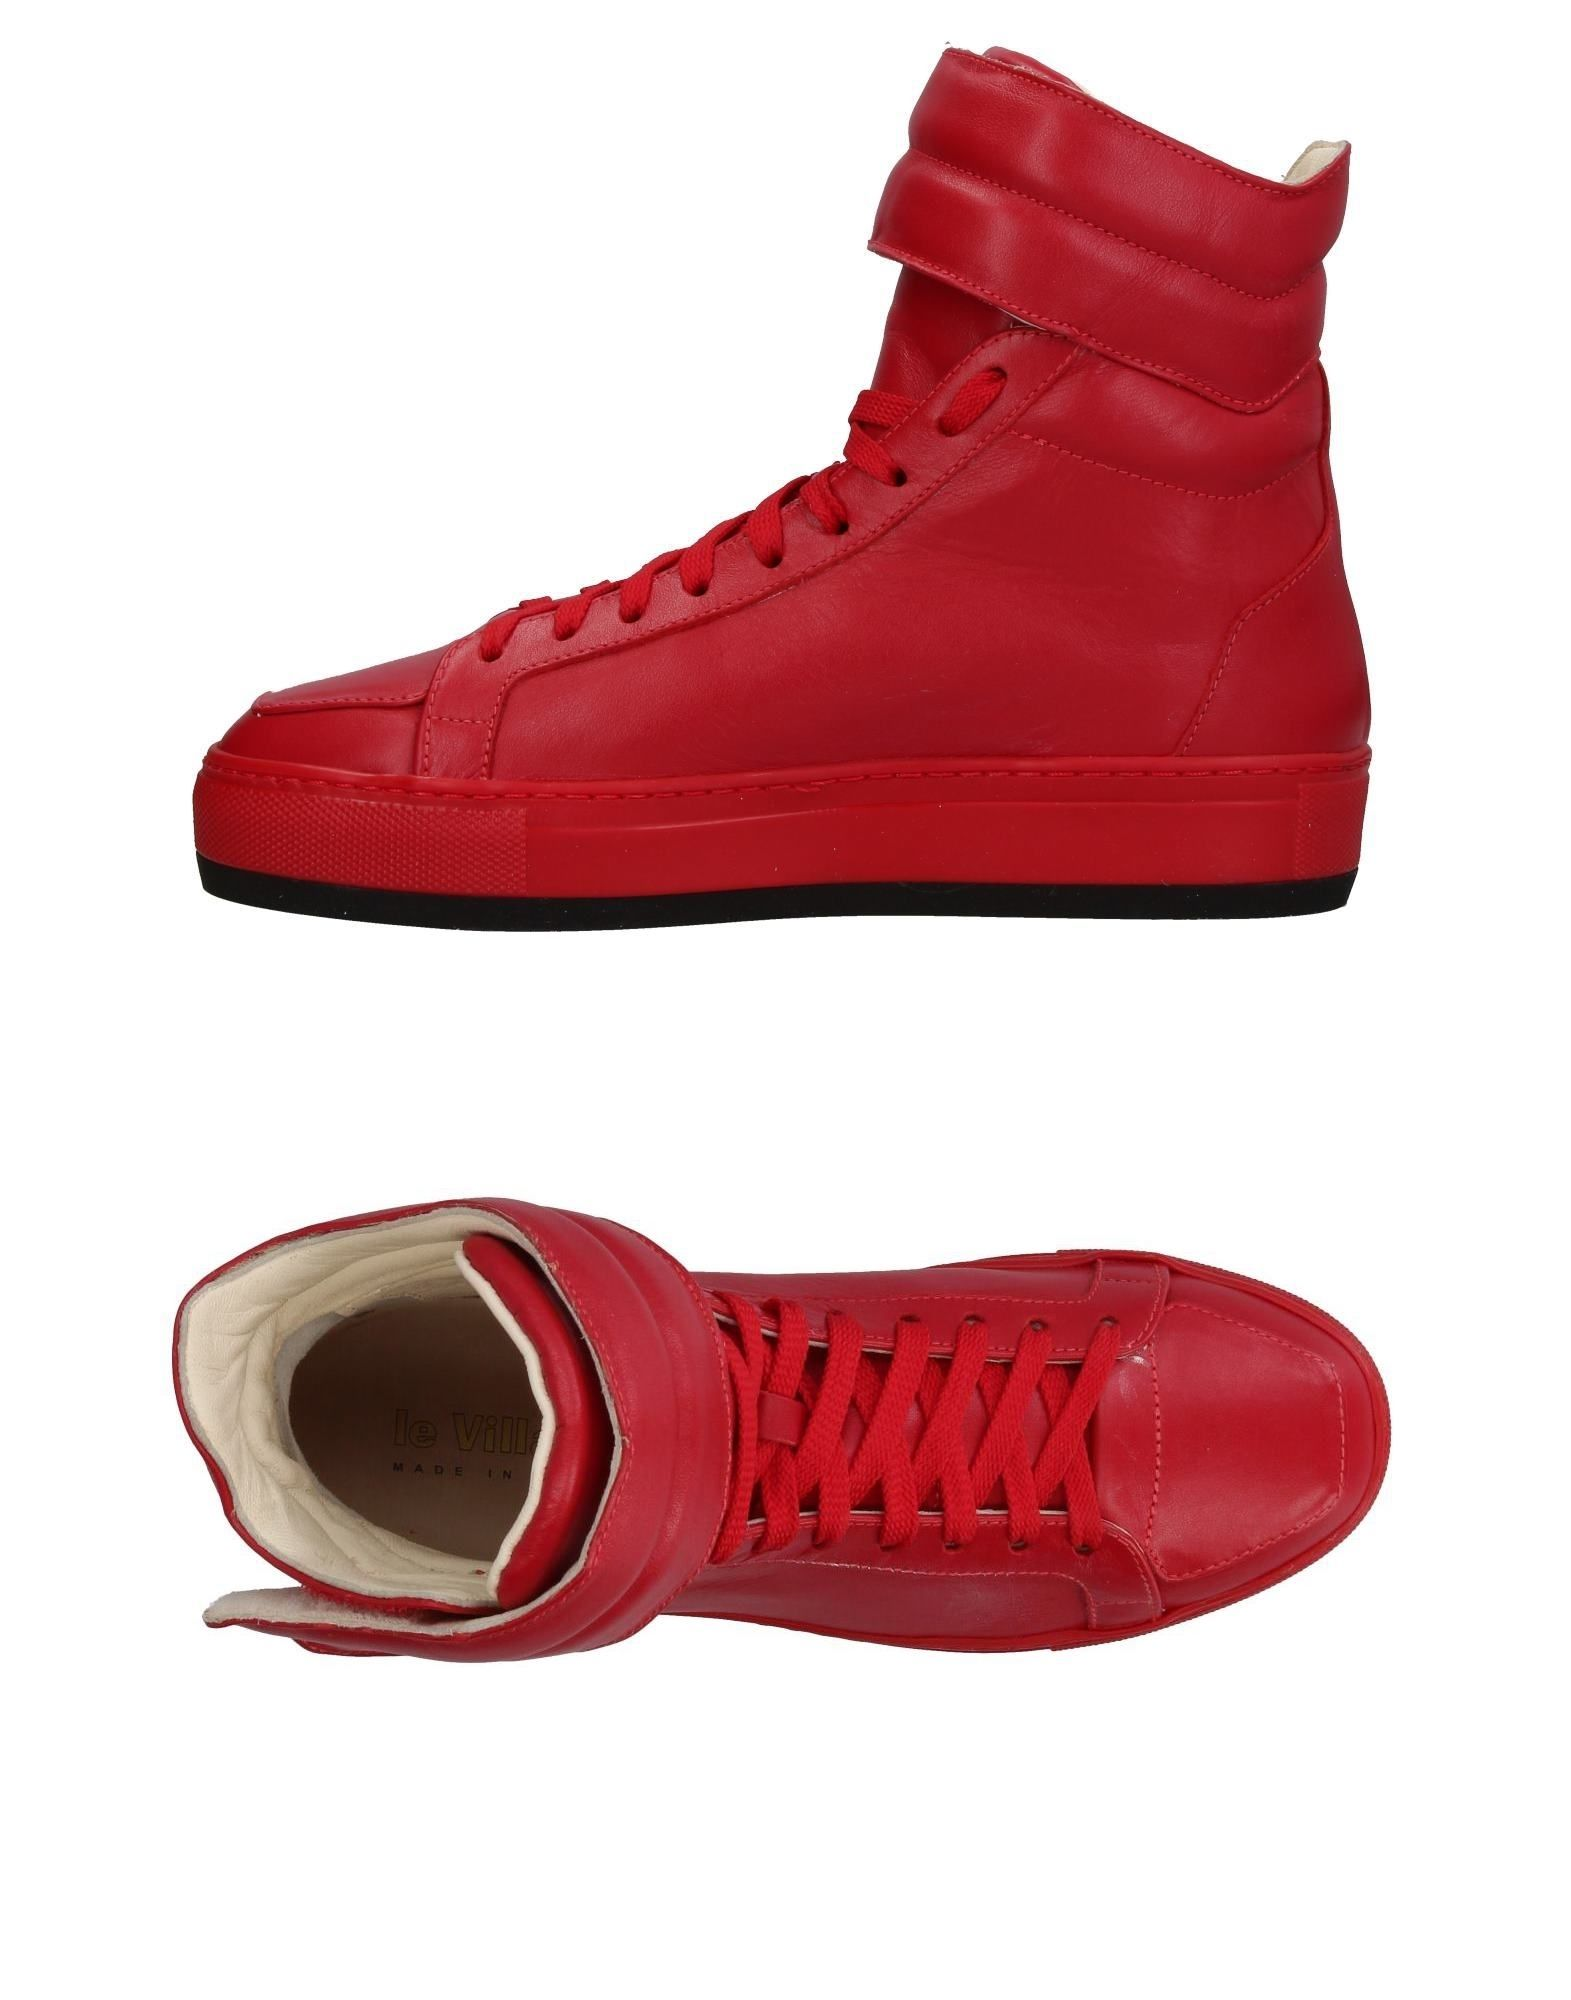 LE VILLAGE Высокие кеды и кроссовки кеды кроссовки высокие женские dc evan hi le brown dark chocolate